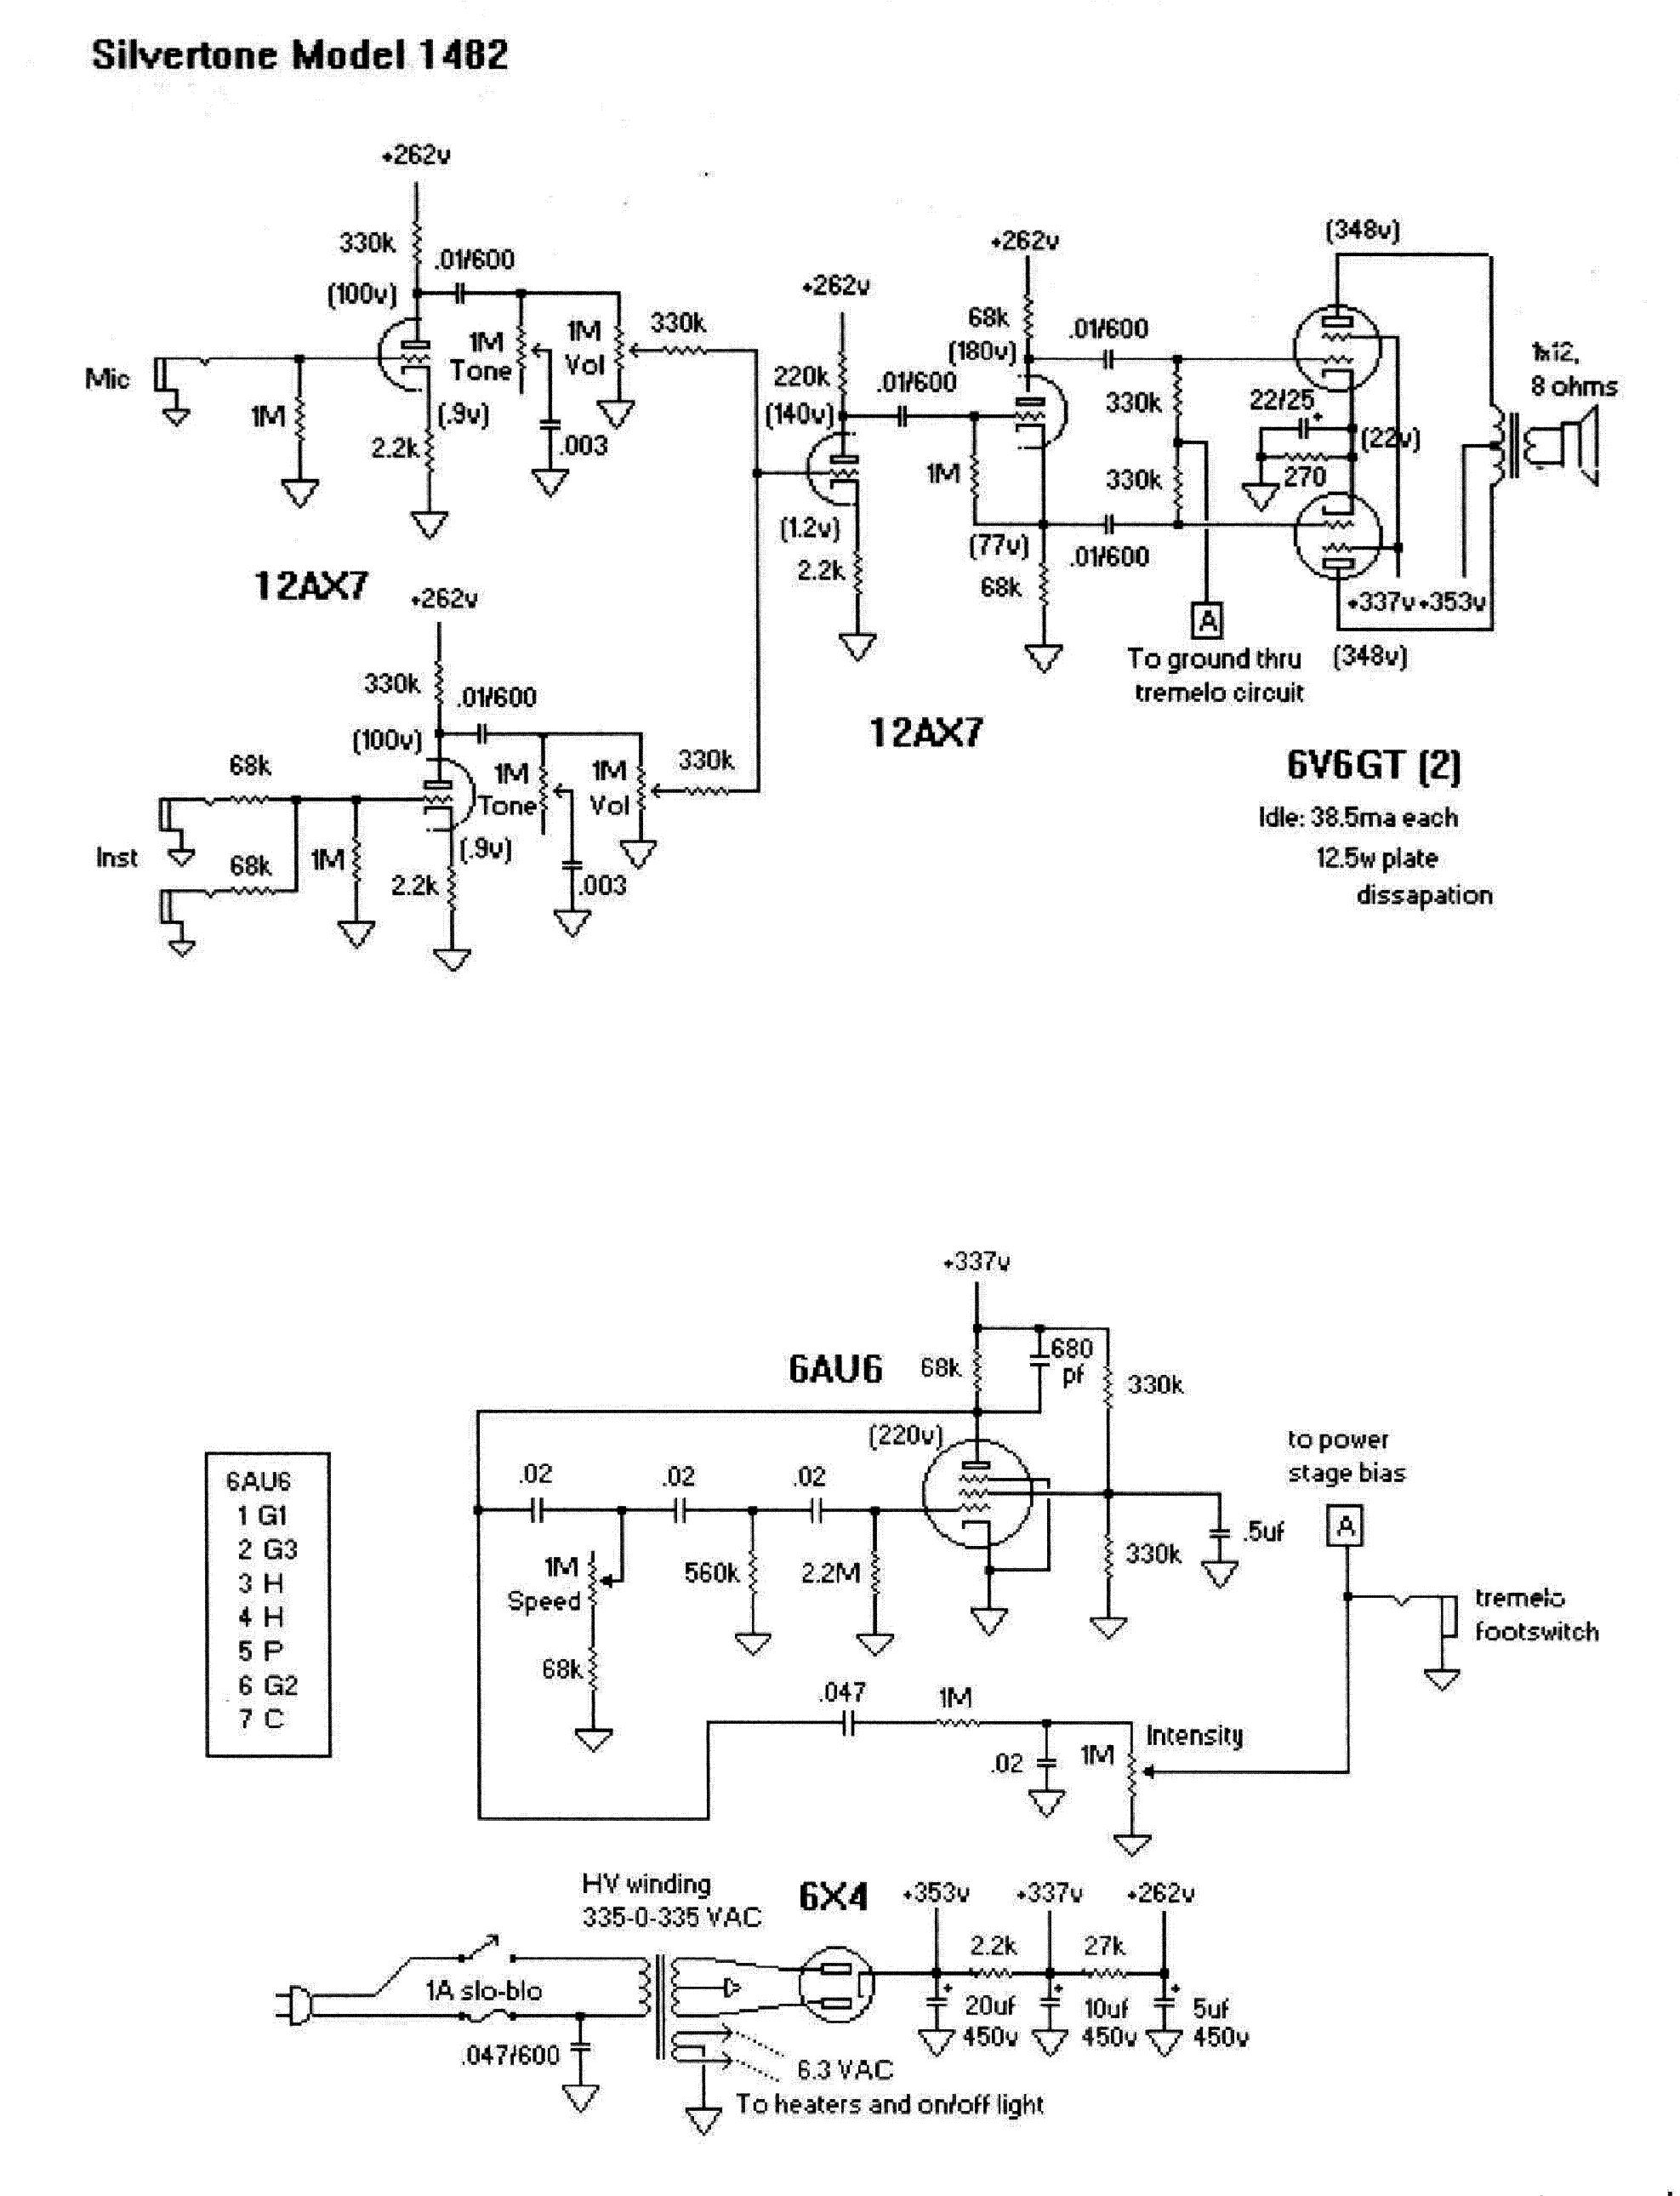 Silvertone 1482 Wiring Diagram Schematic Diagrams 1457 1301 Sch Service Manual Download Schematics Eeprom Vega